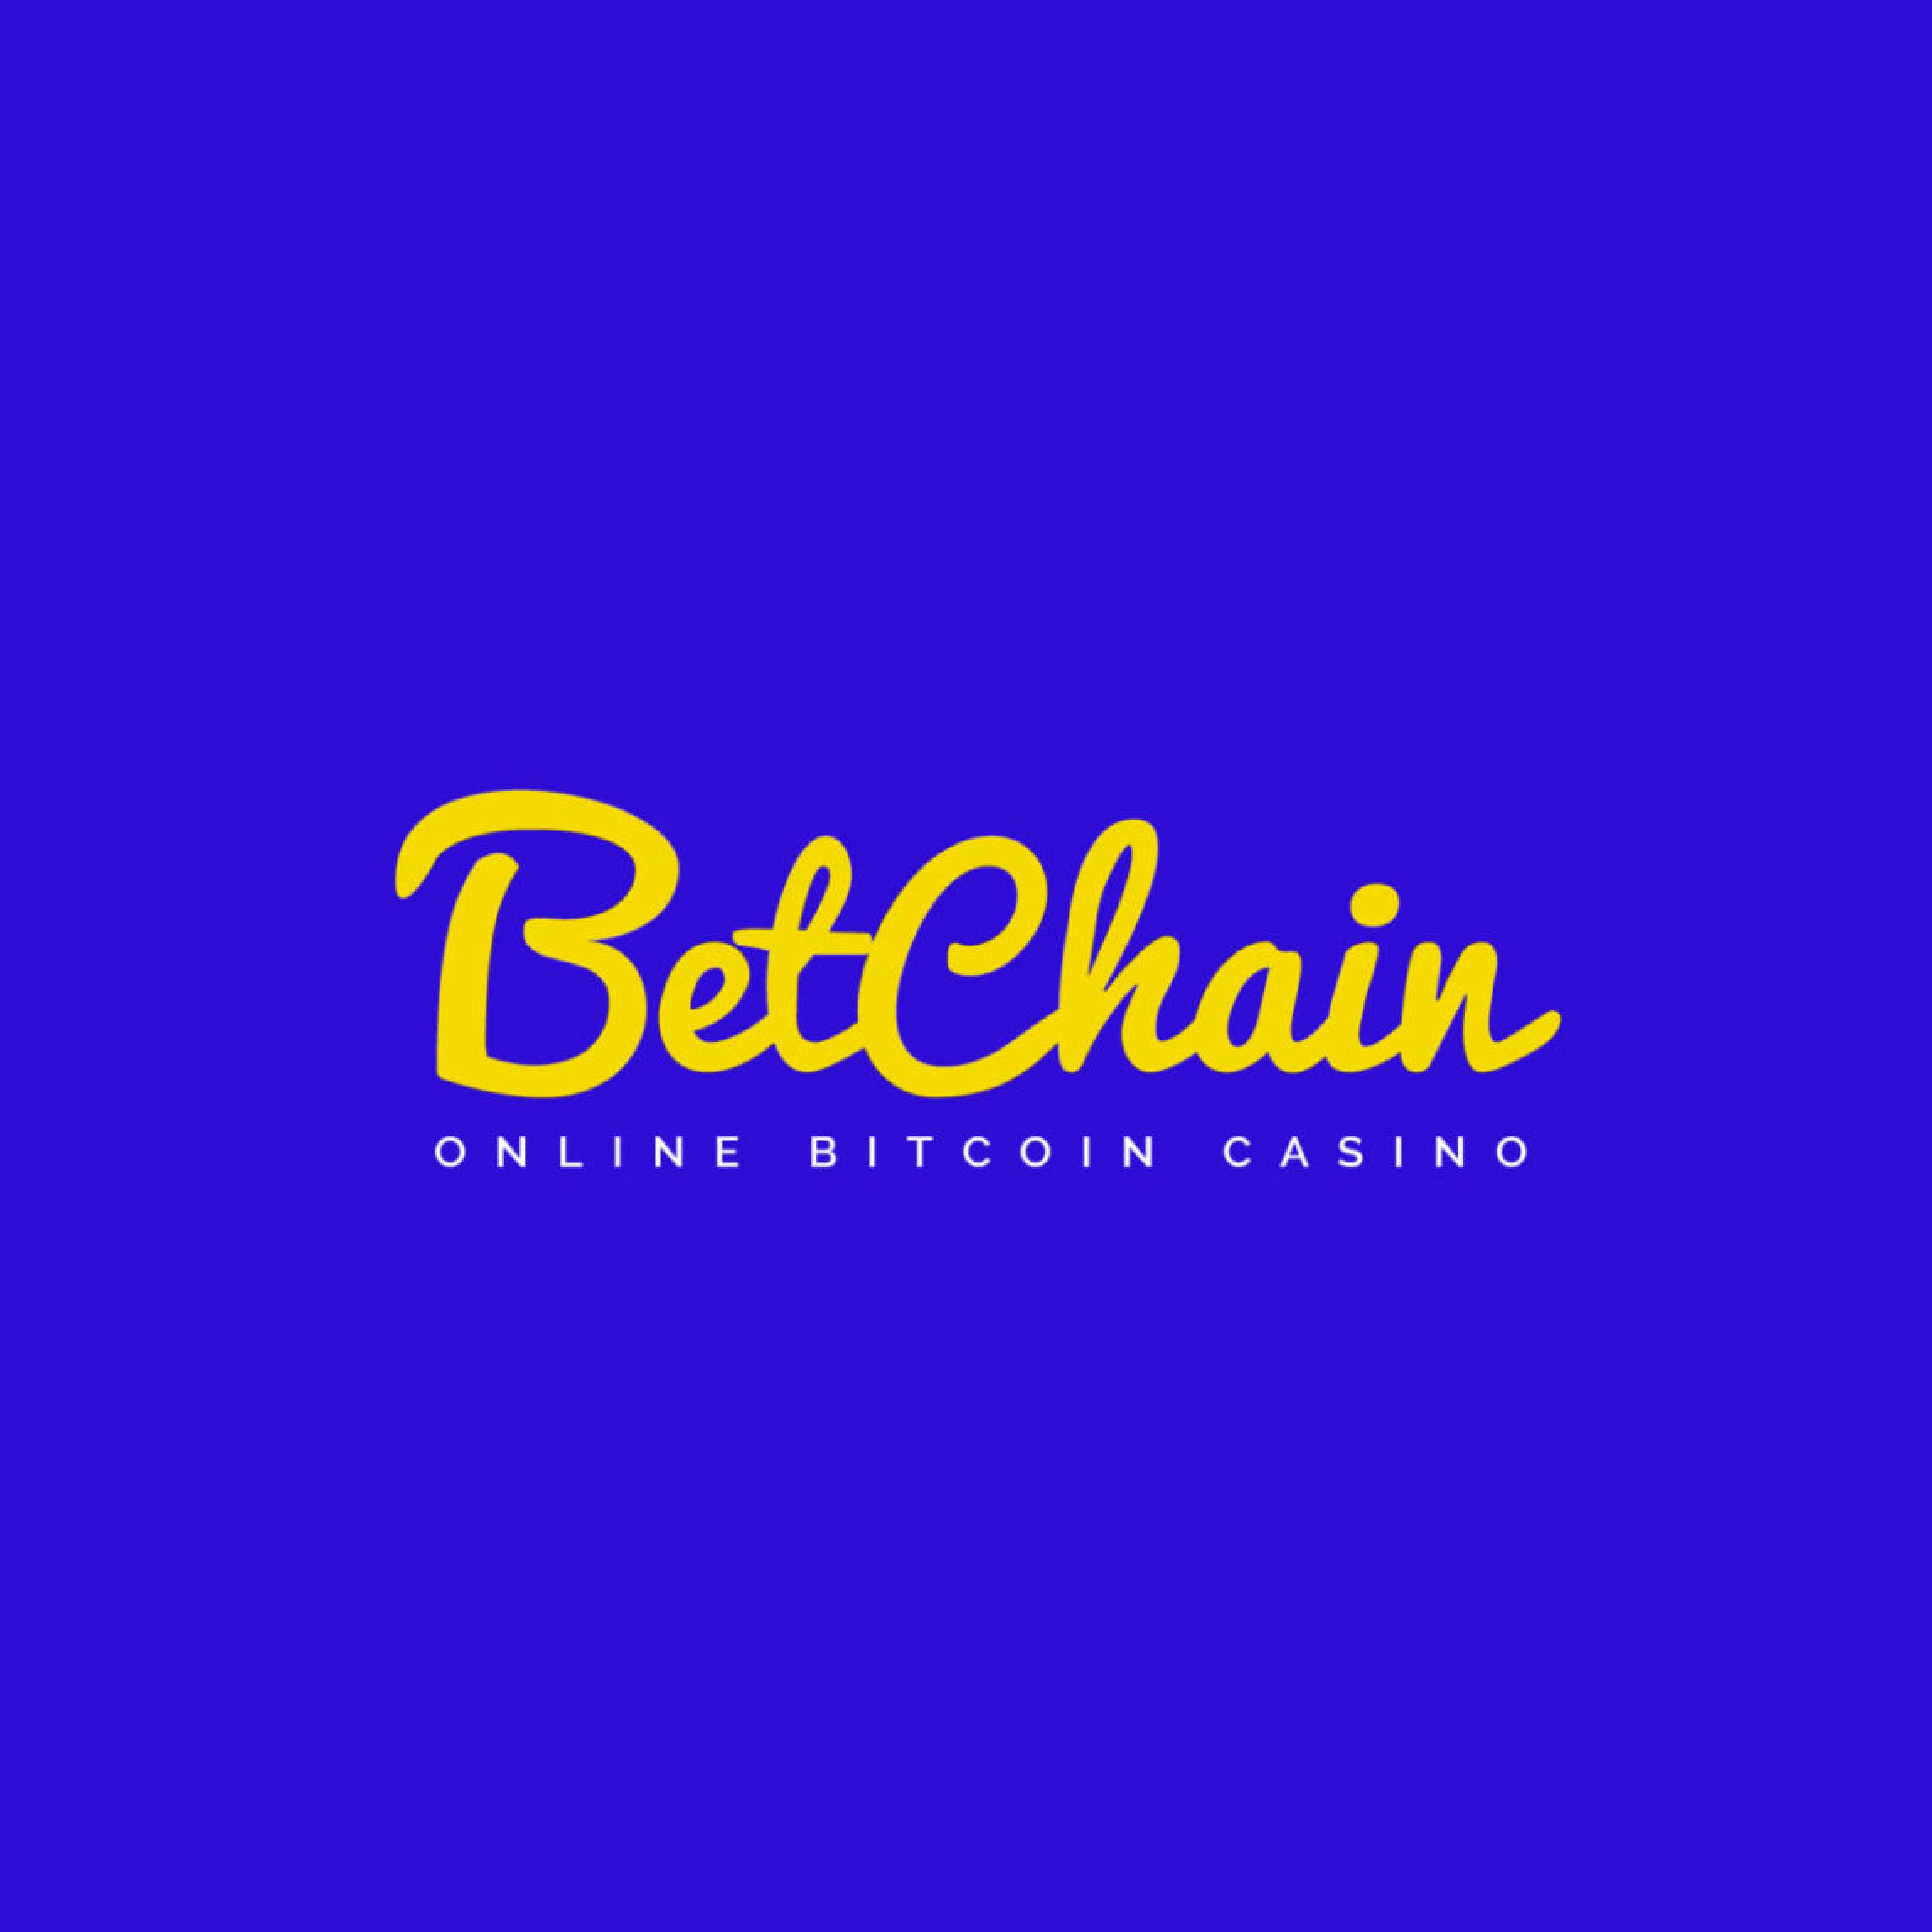 Bitcoin gambler